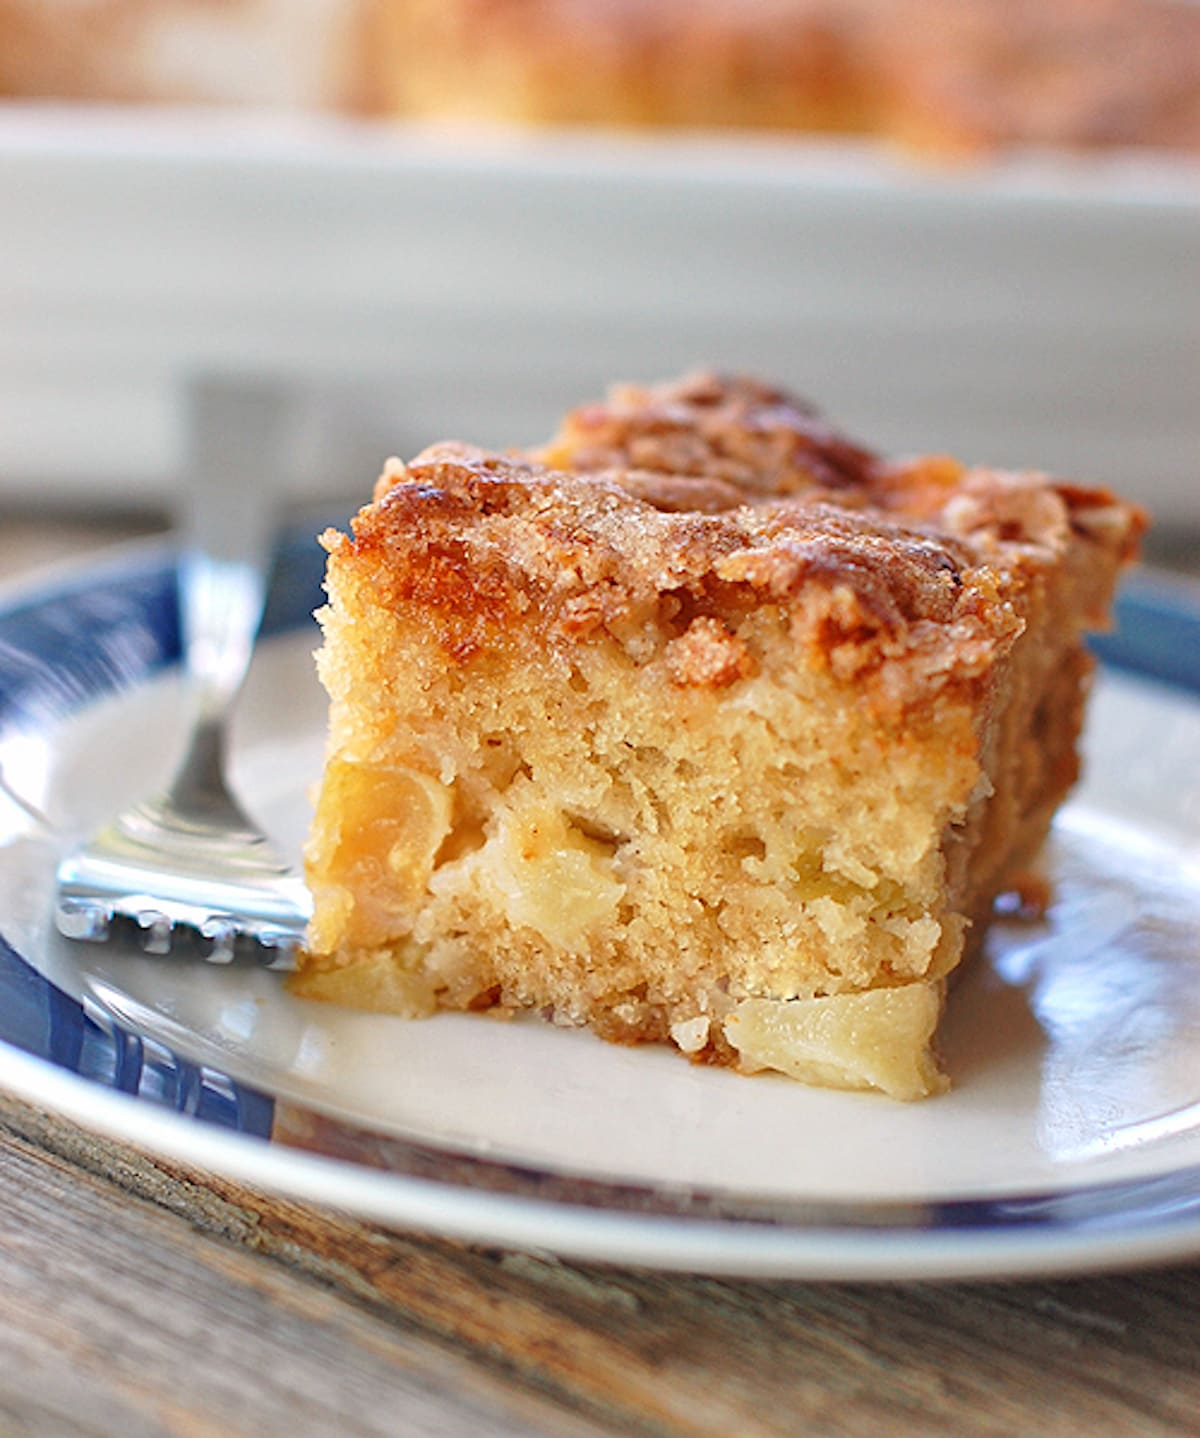 Cinnamon Sugar Apple Cake #cinnamon #sugar #apple #applerecipes #cake #cakerecipes #dessert #dessertrecipes